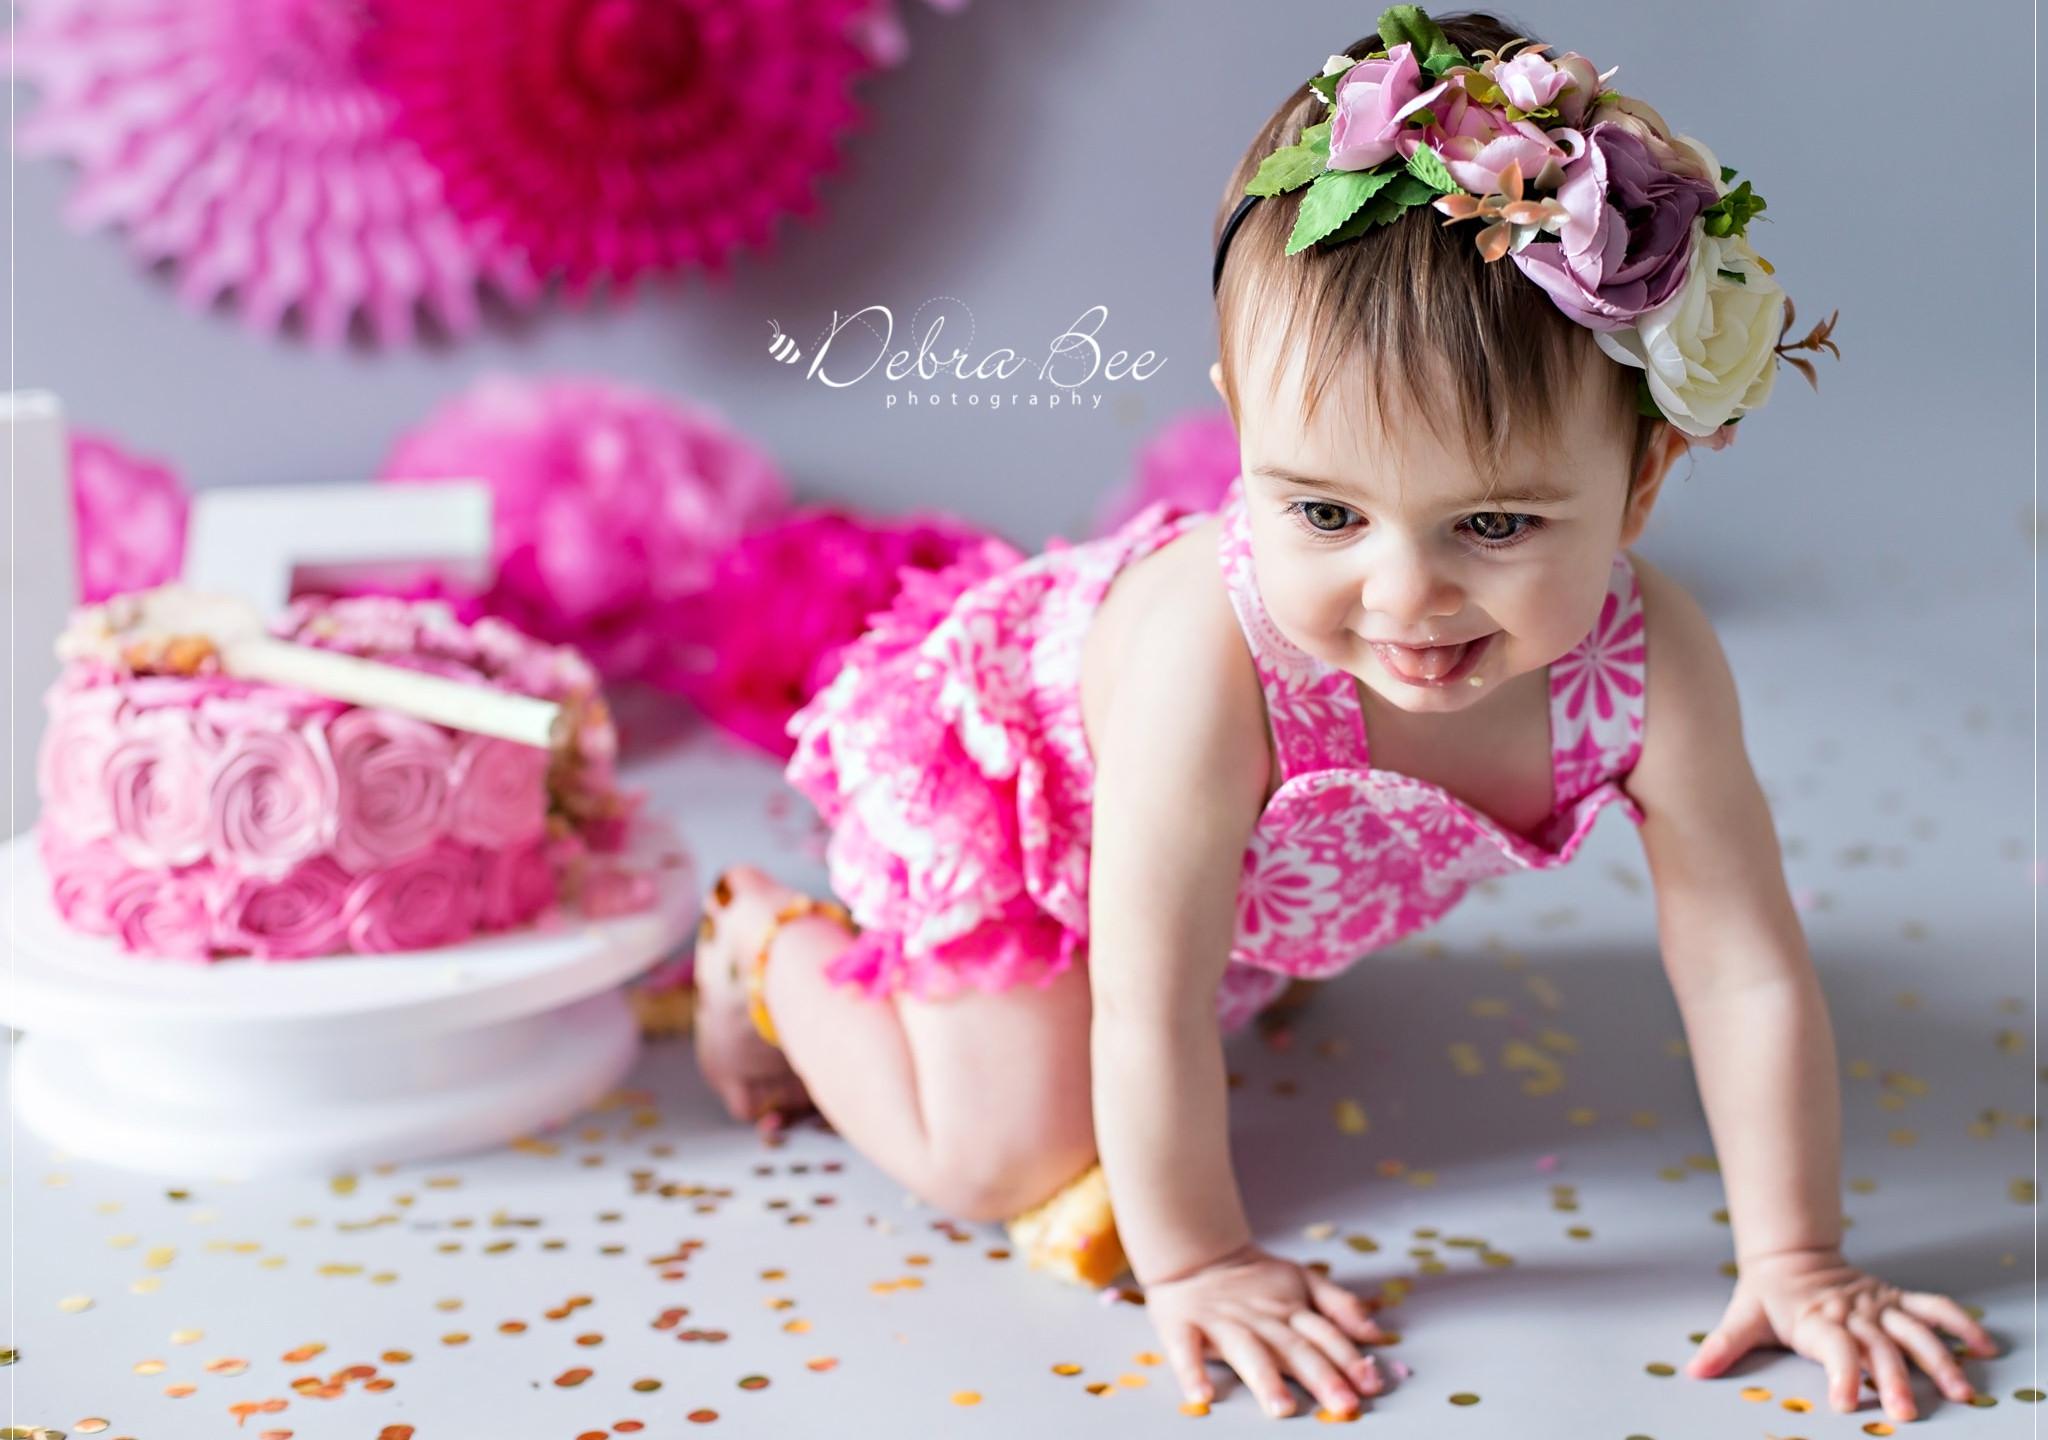 Cake Smash Photo Shoot